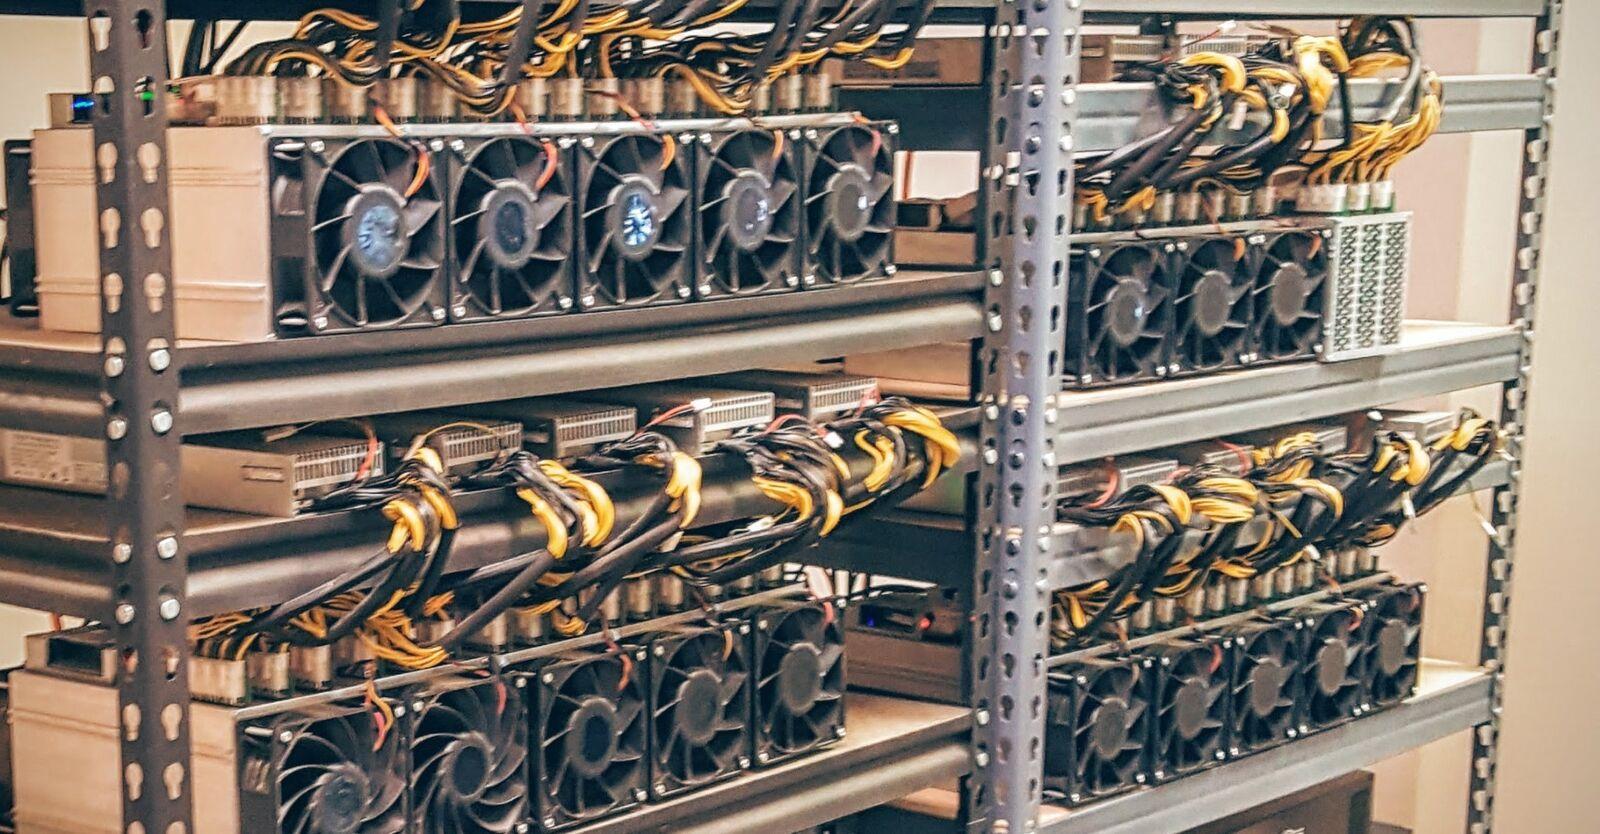 the blockchain store